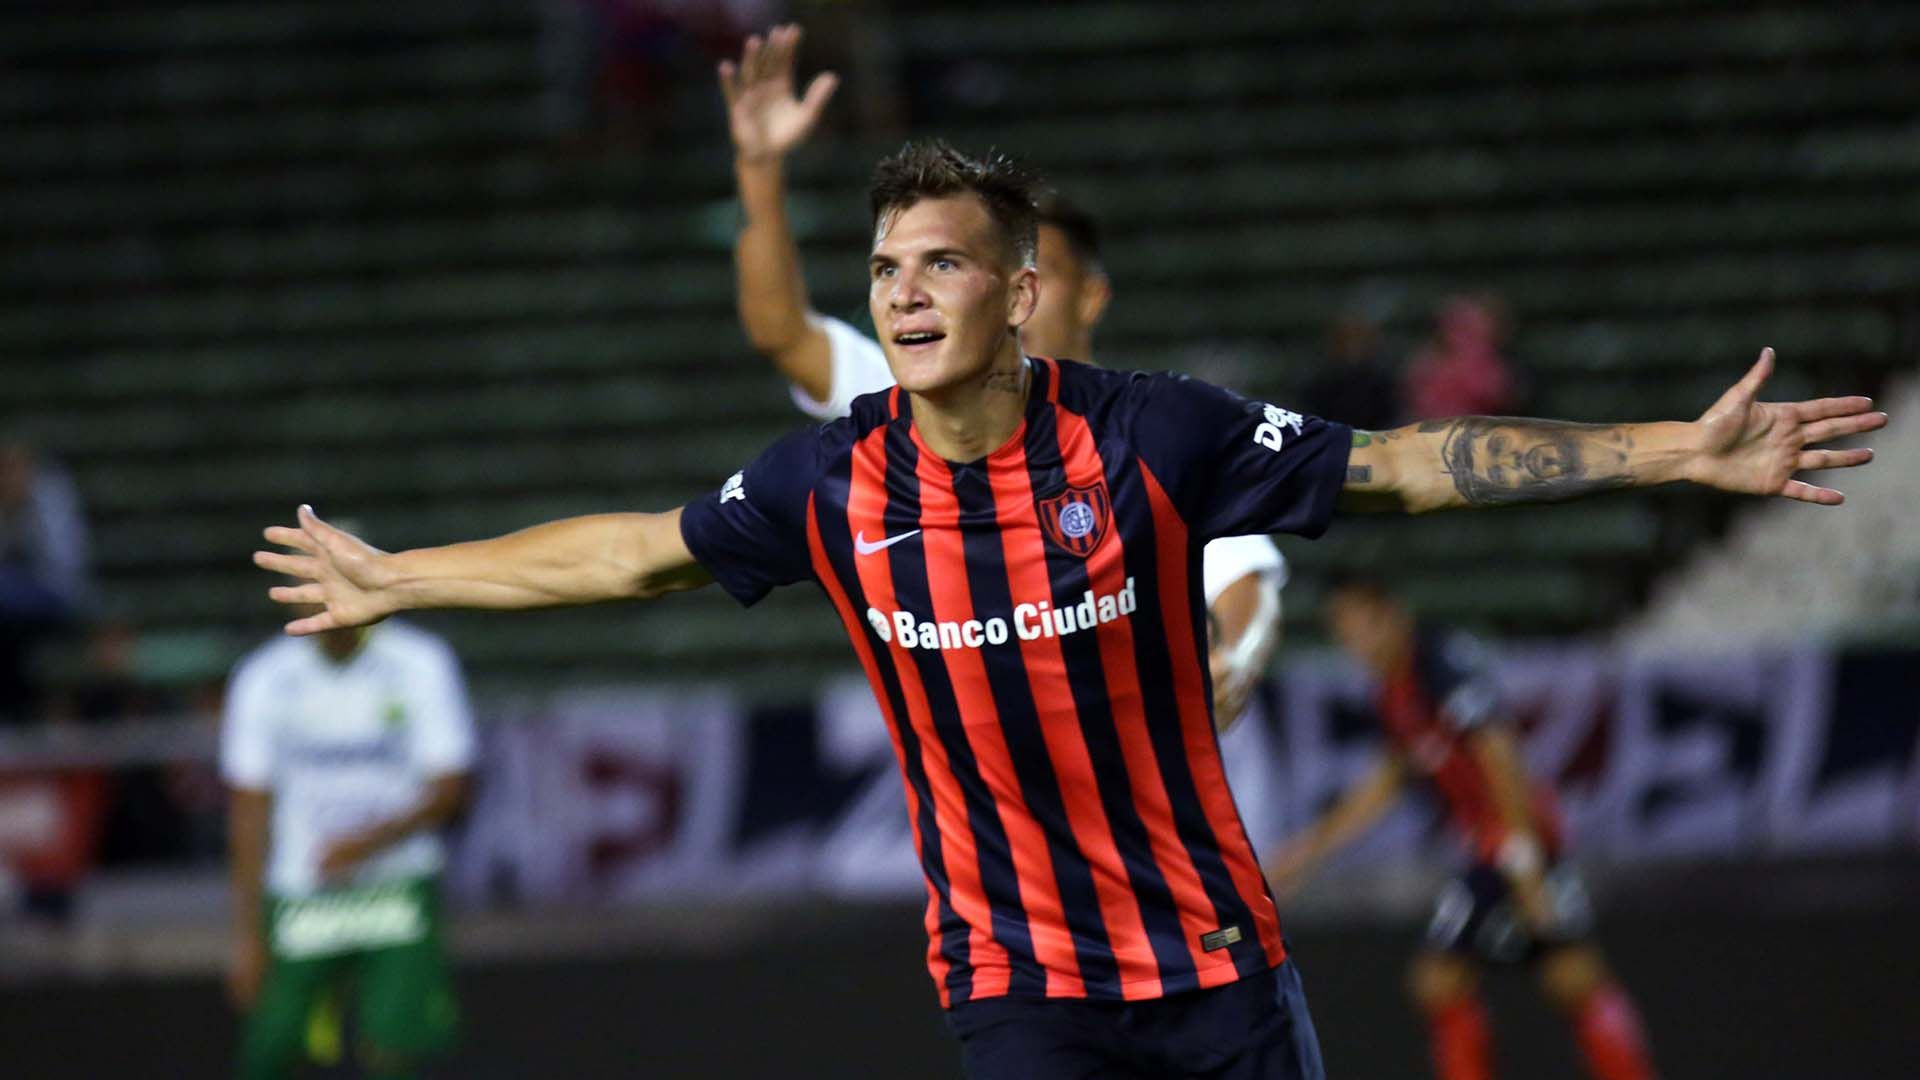 San Lorenzo enfrenta a Belgrano por un lugar en la Libertadores